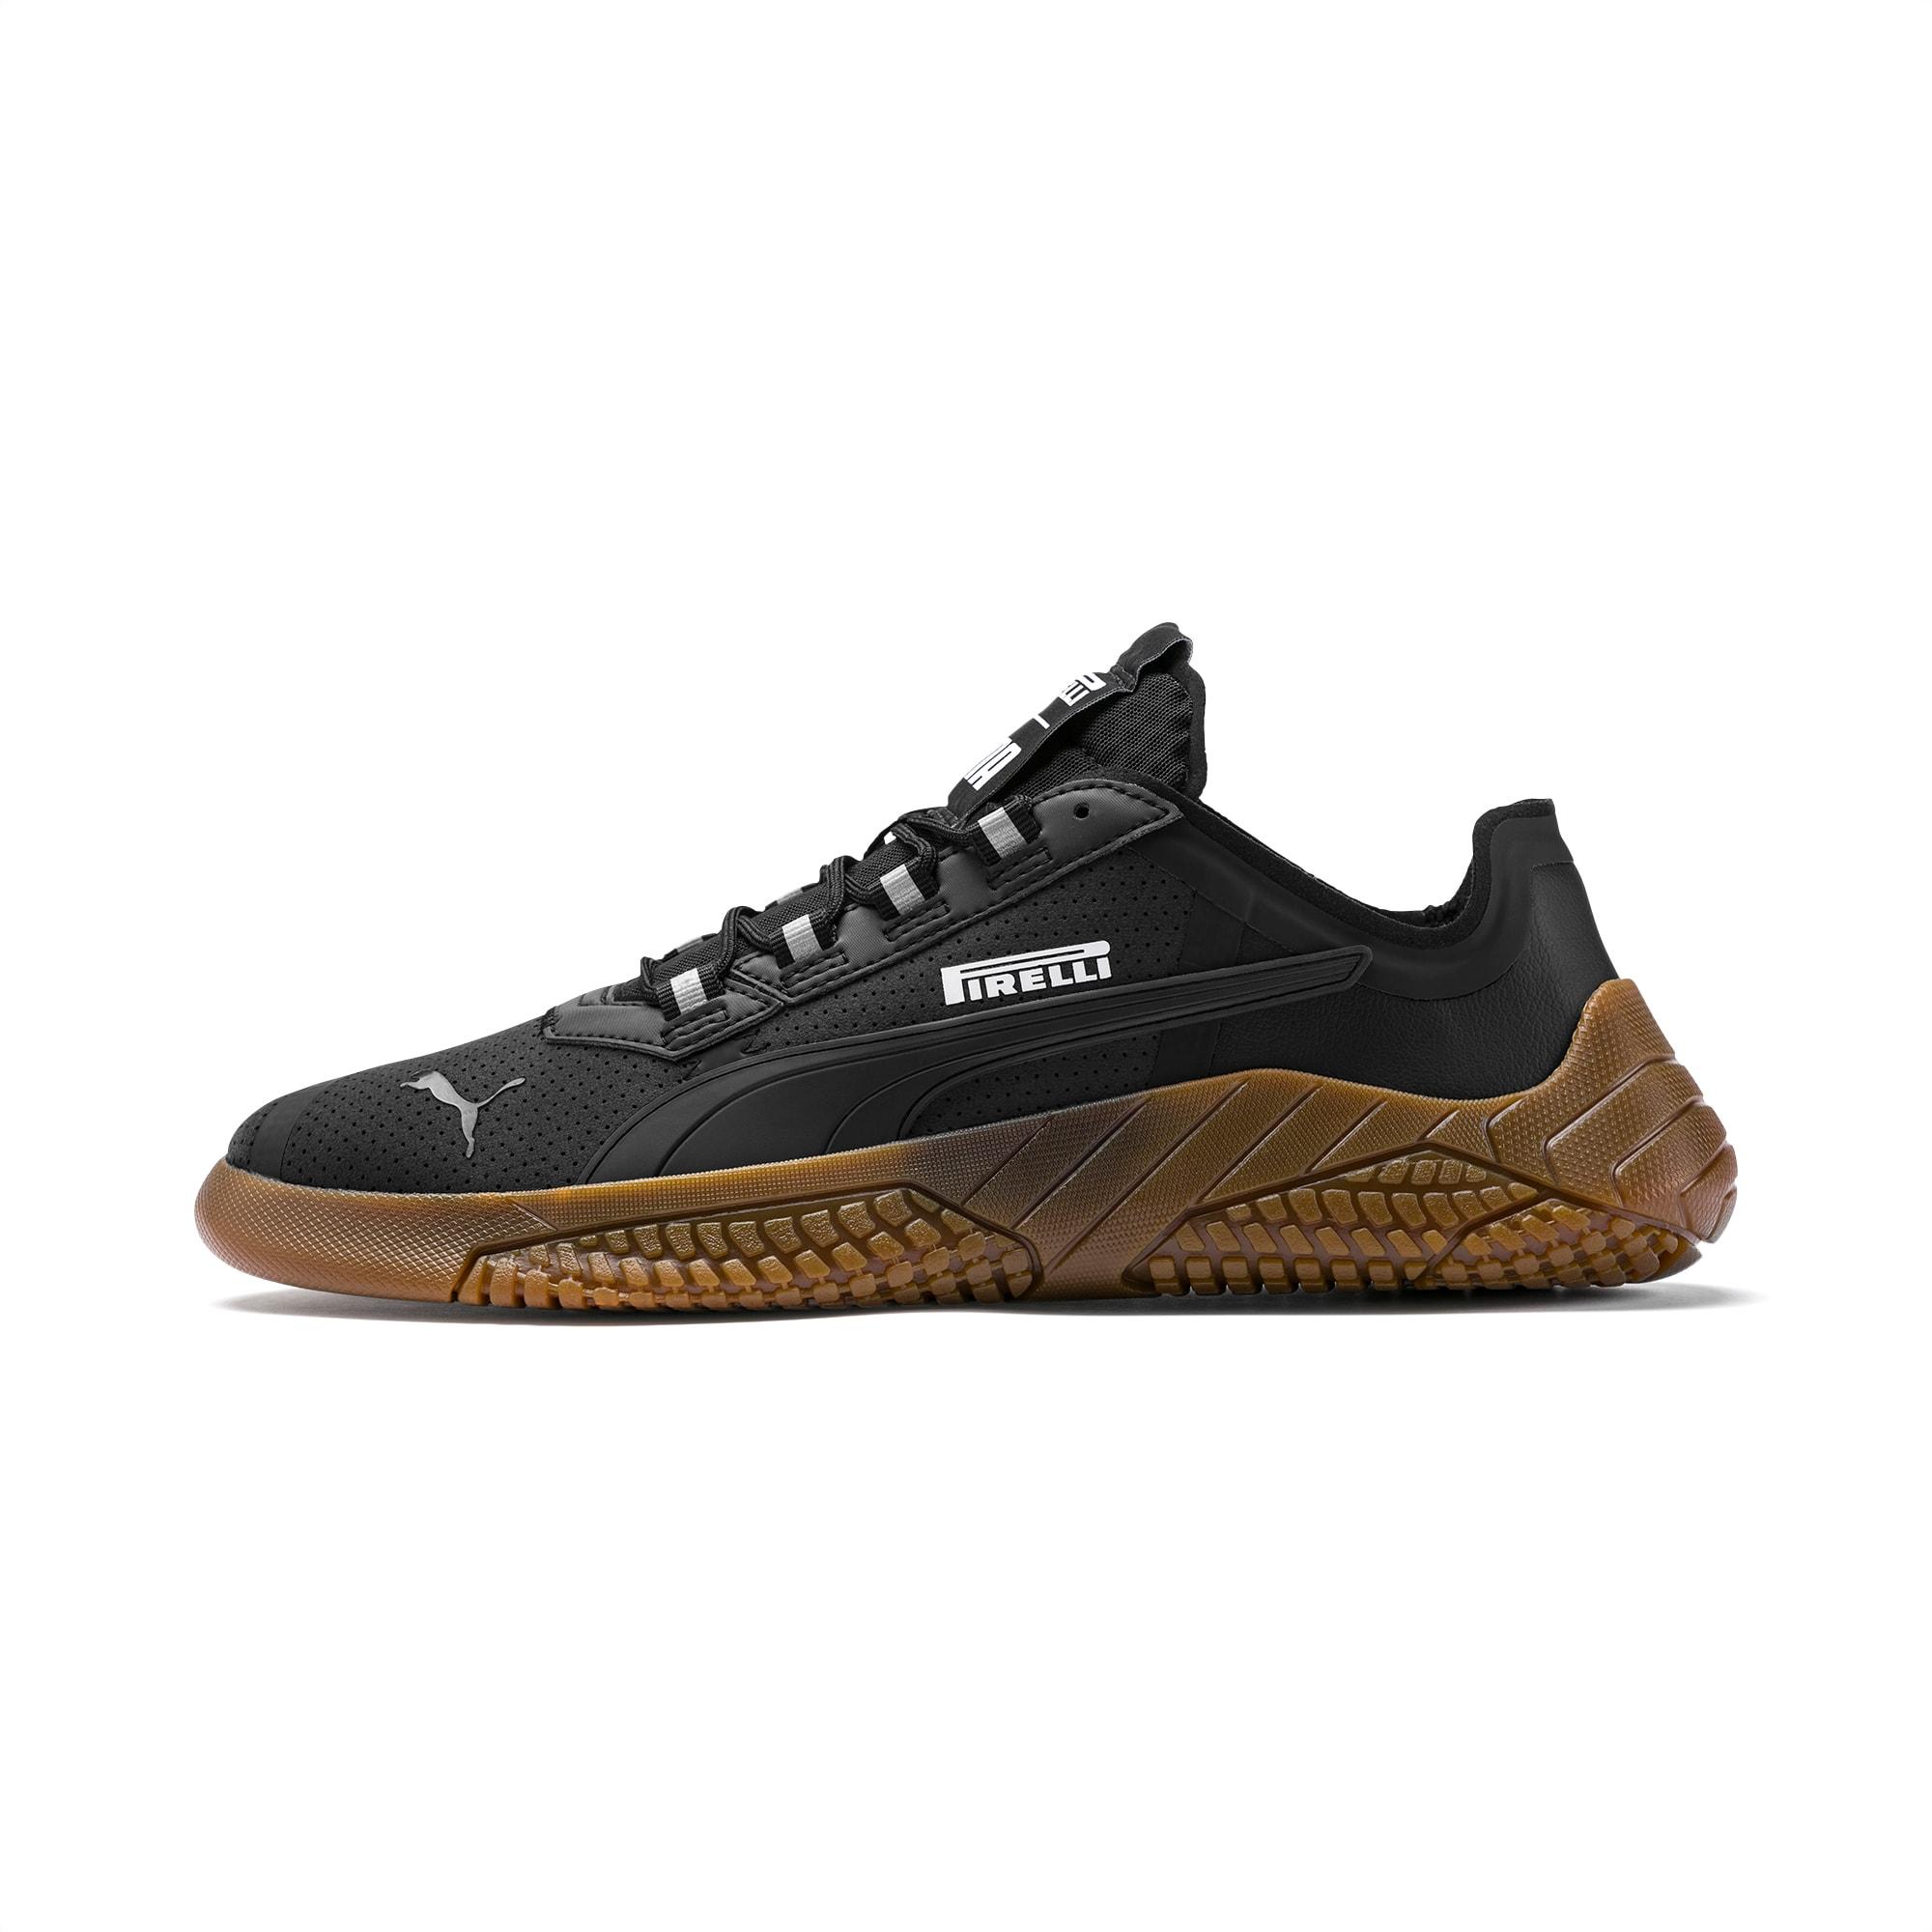 Replicat-X Pirelli Motorsport Shoes